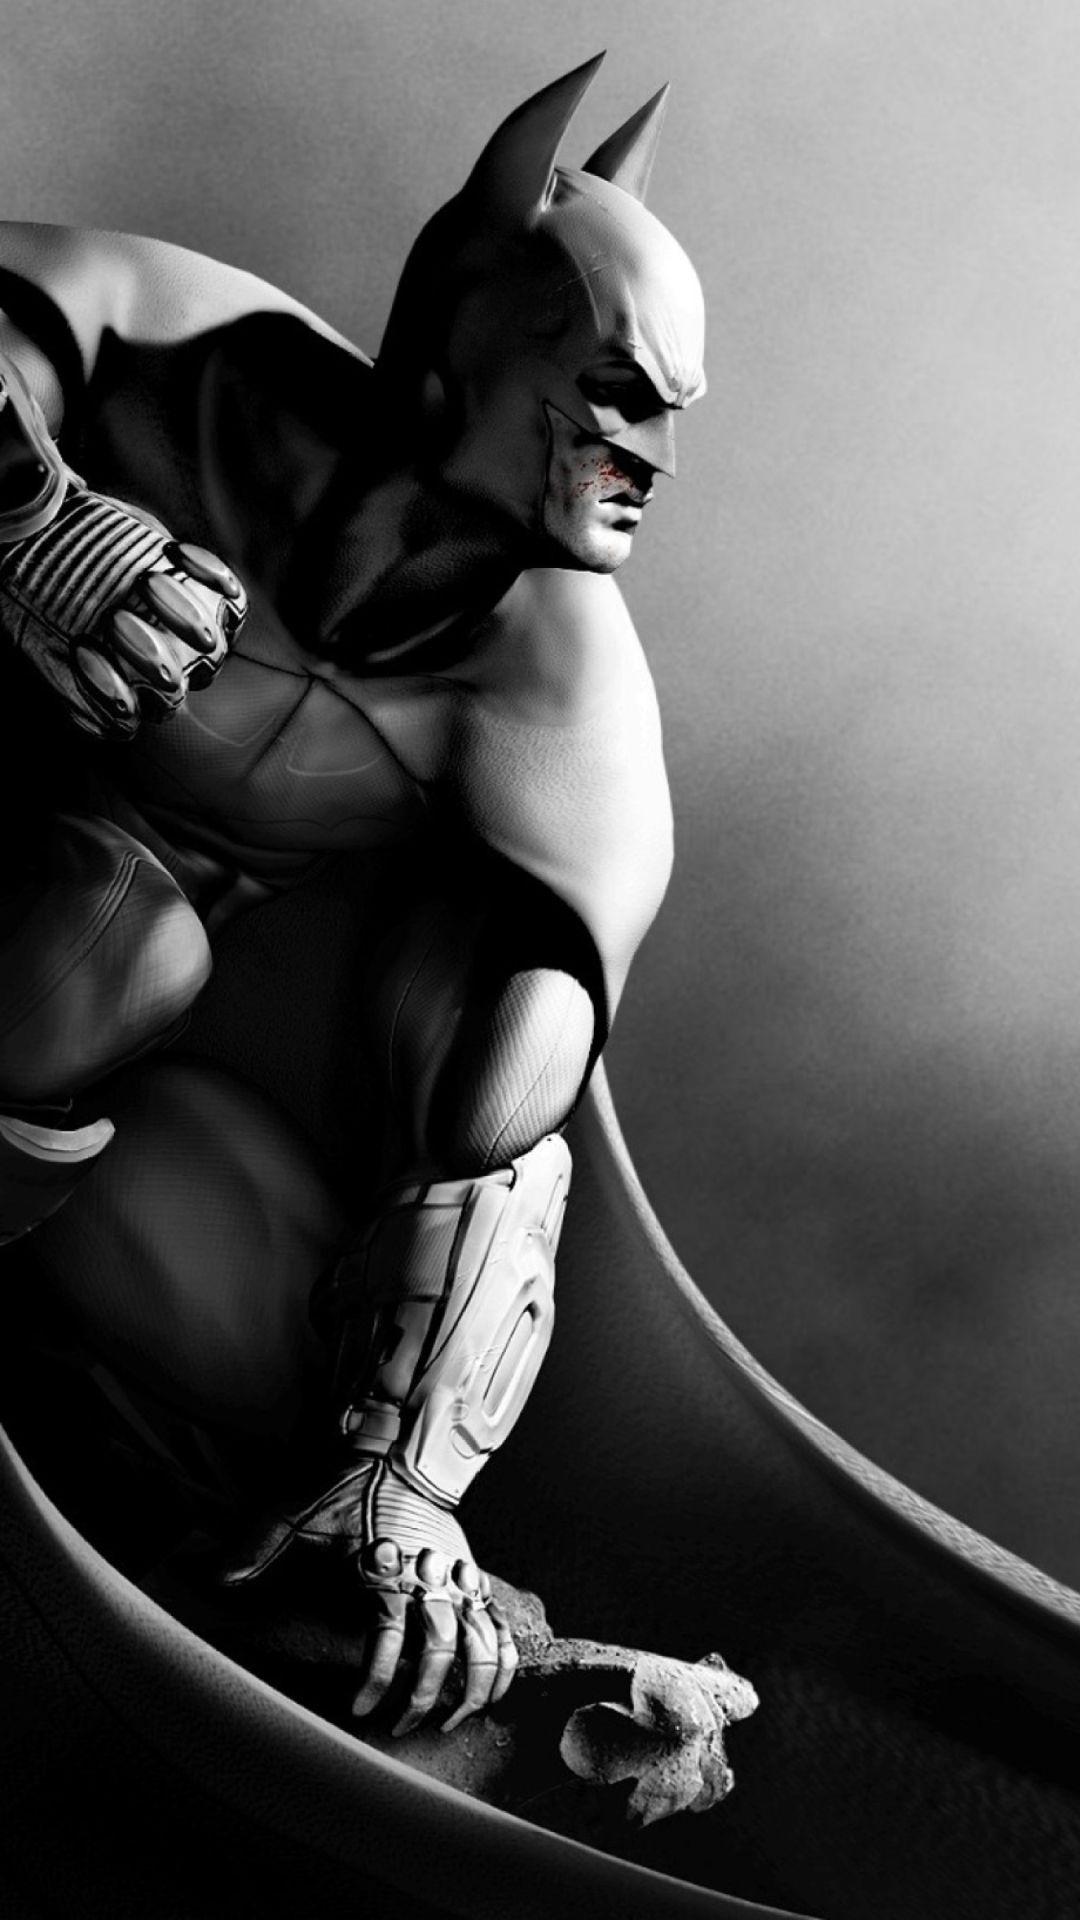 Batman D Art Wallpaper For Iphone Plus